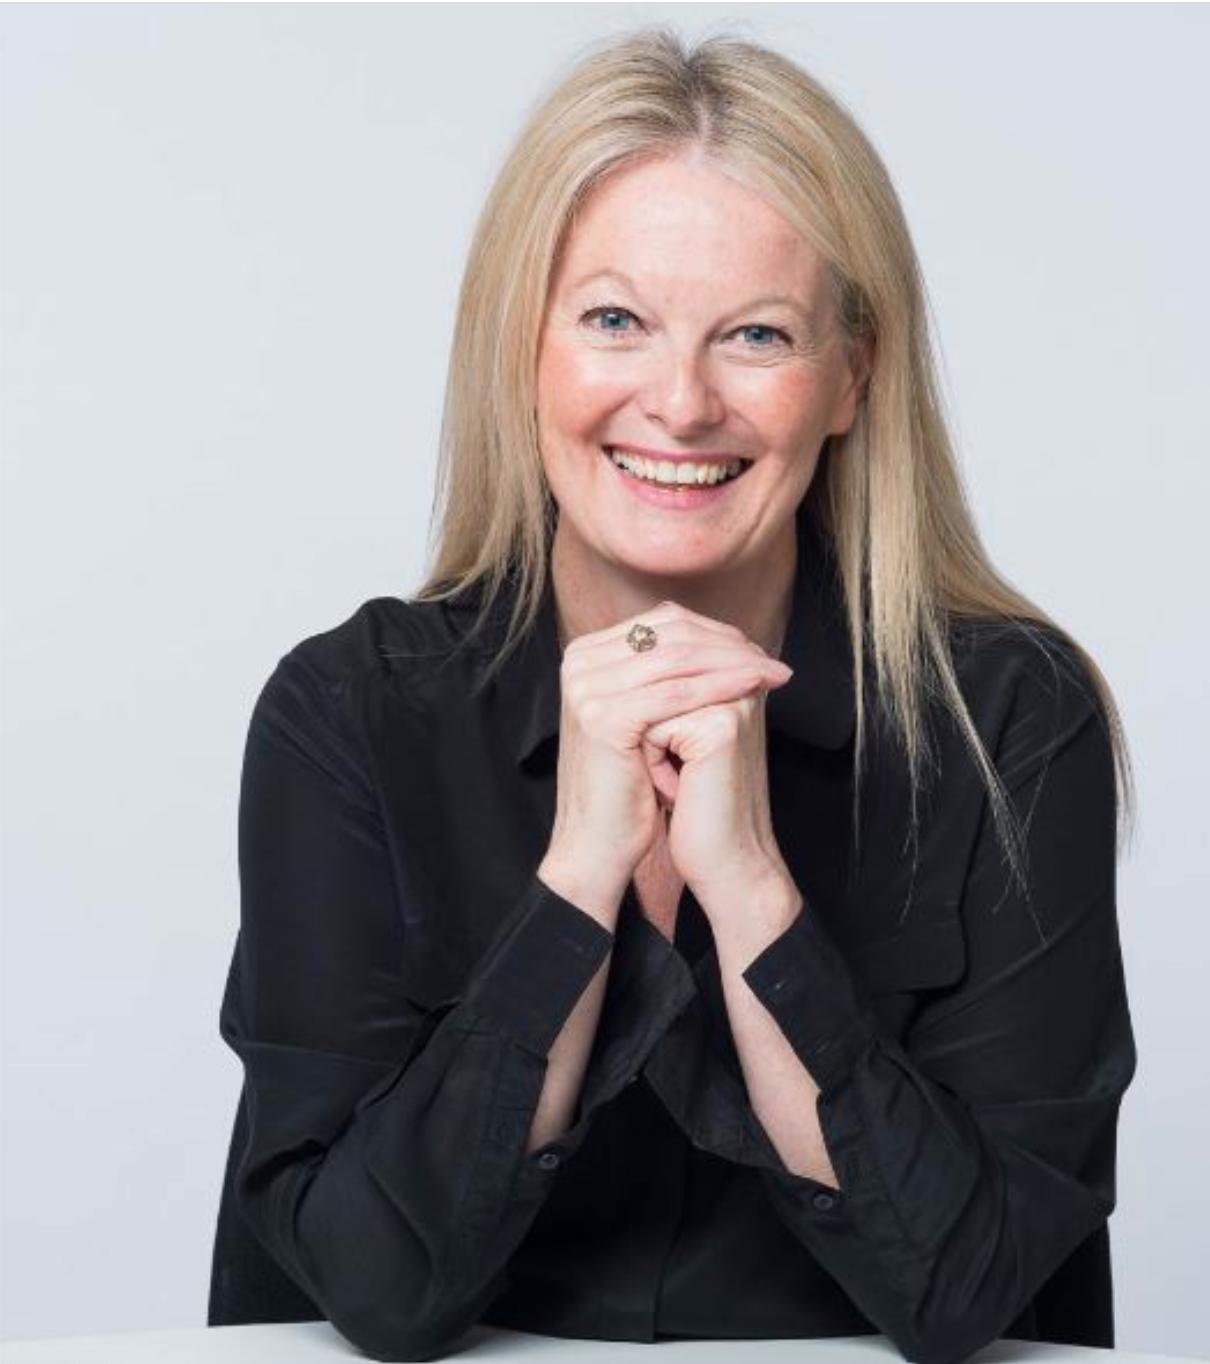 Above: Julie Driscoll, Hyve's UK regional director.